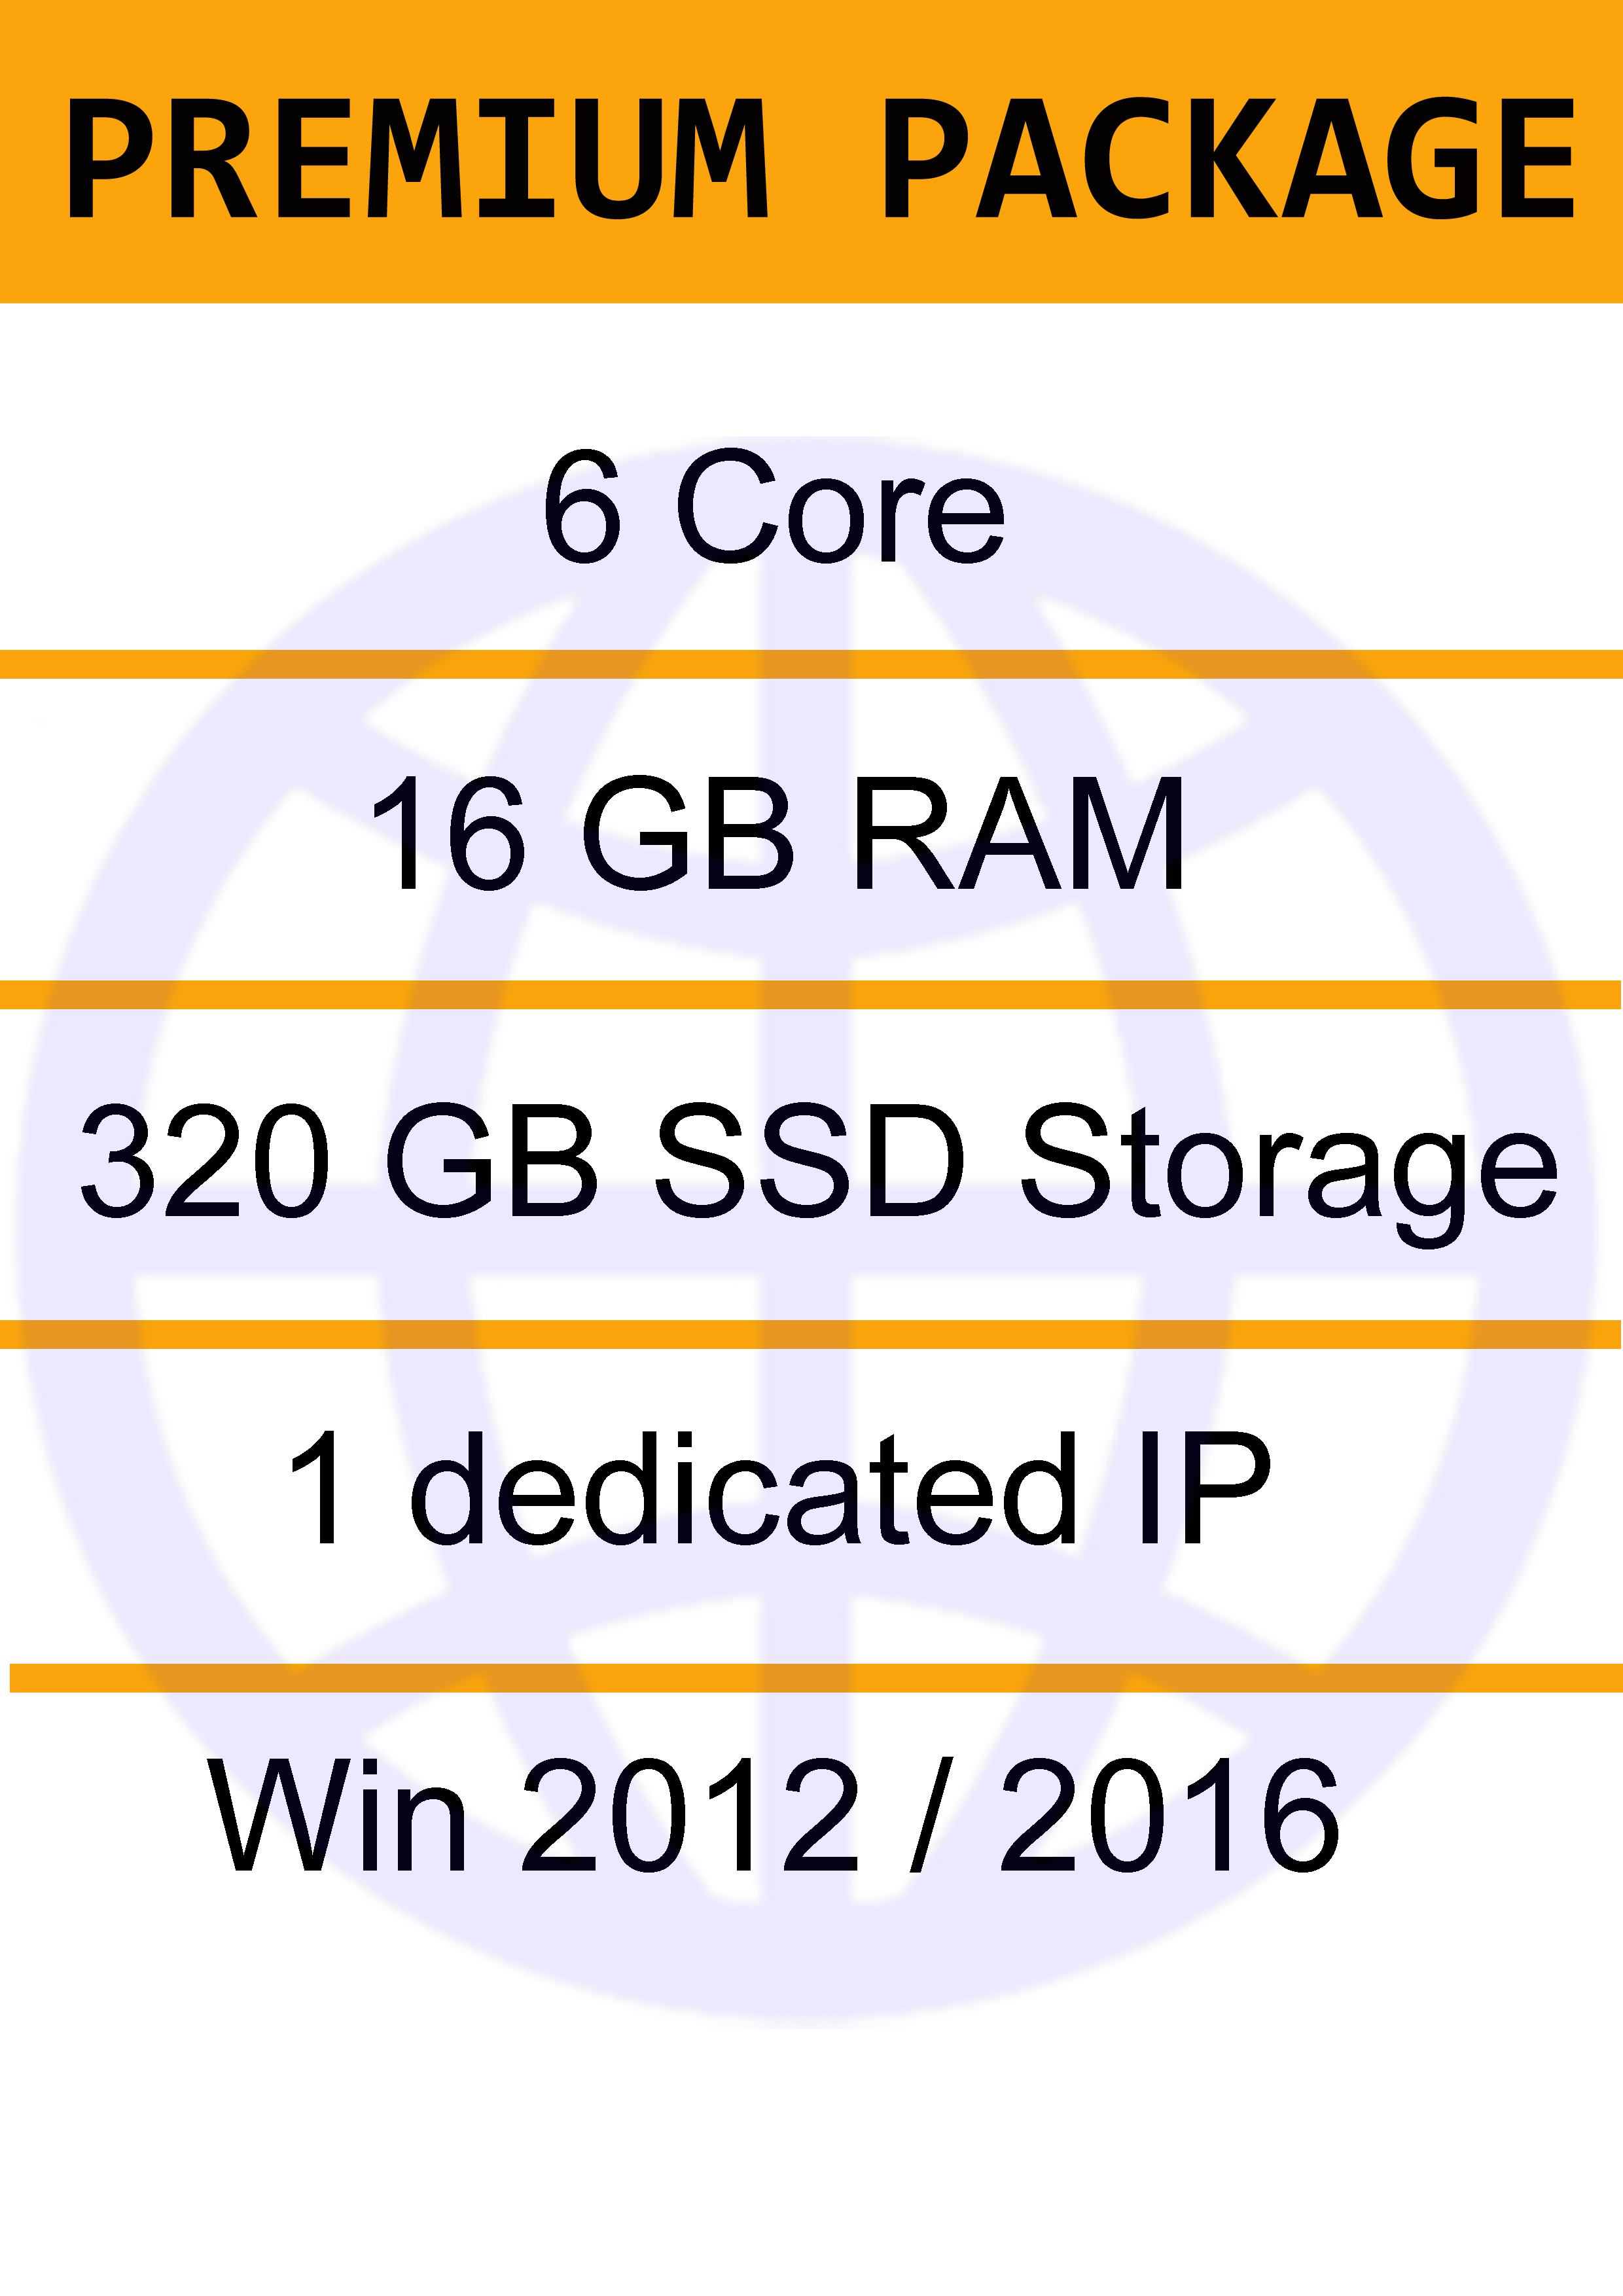 Windows VPS 16 GB - 6 Vcore - 320 GB SSD -